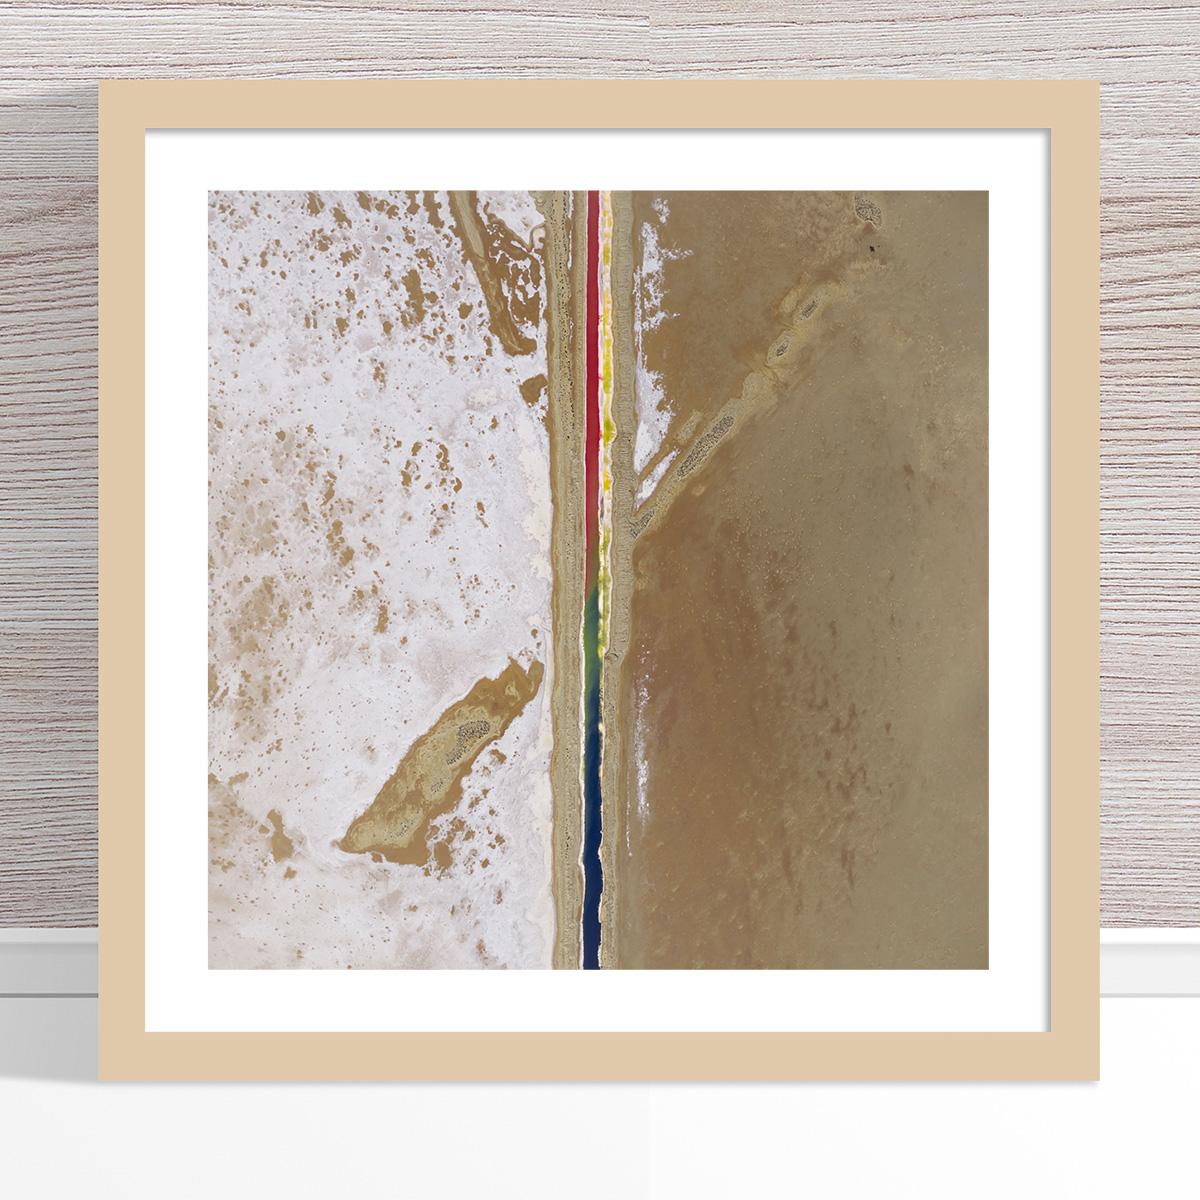 Chris Saunders - 'Aerial Salt 005' Light Frame